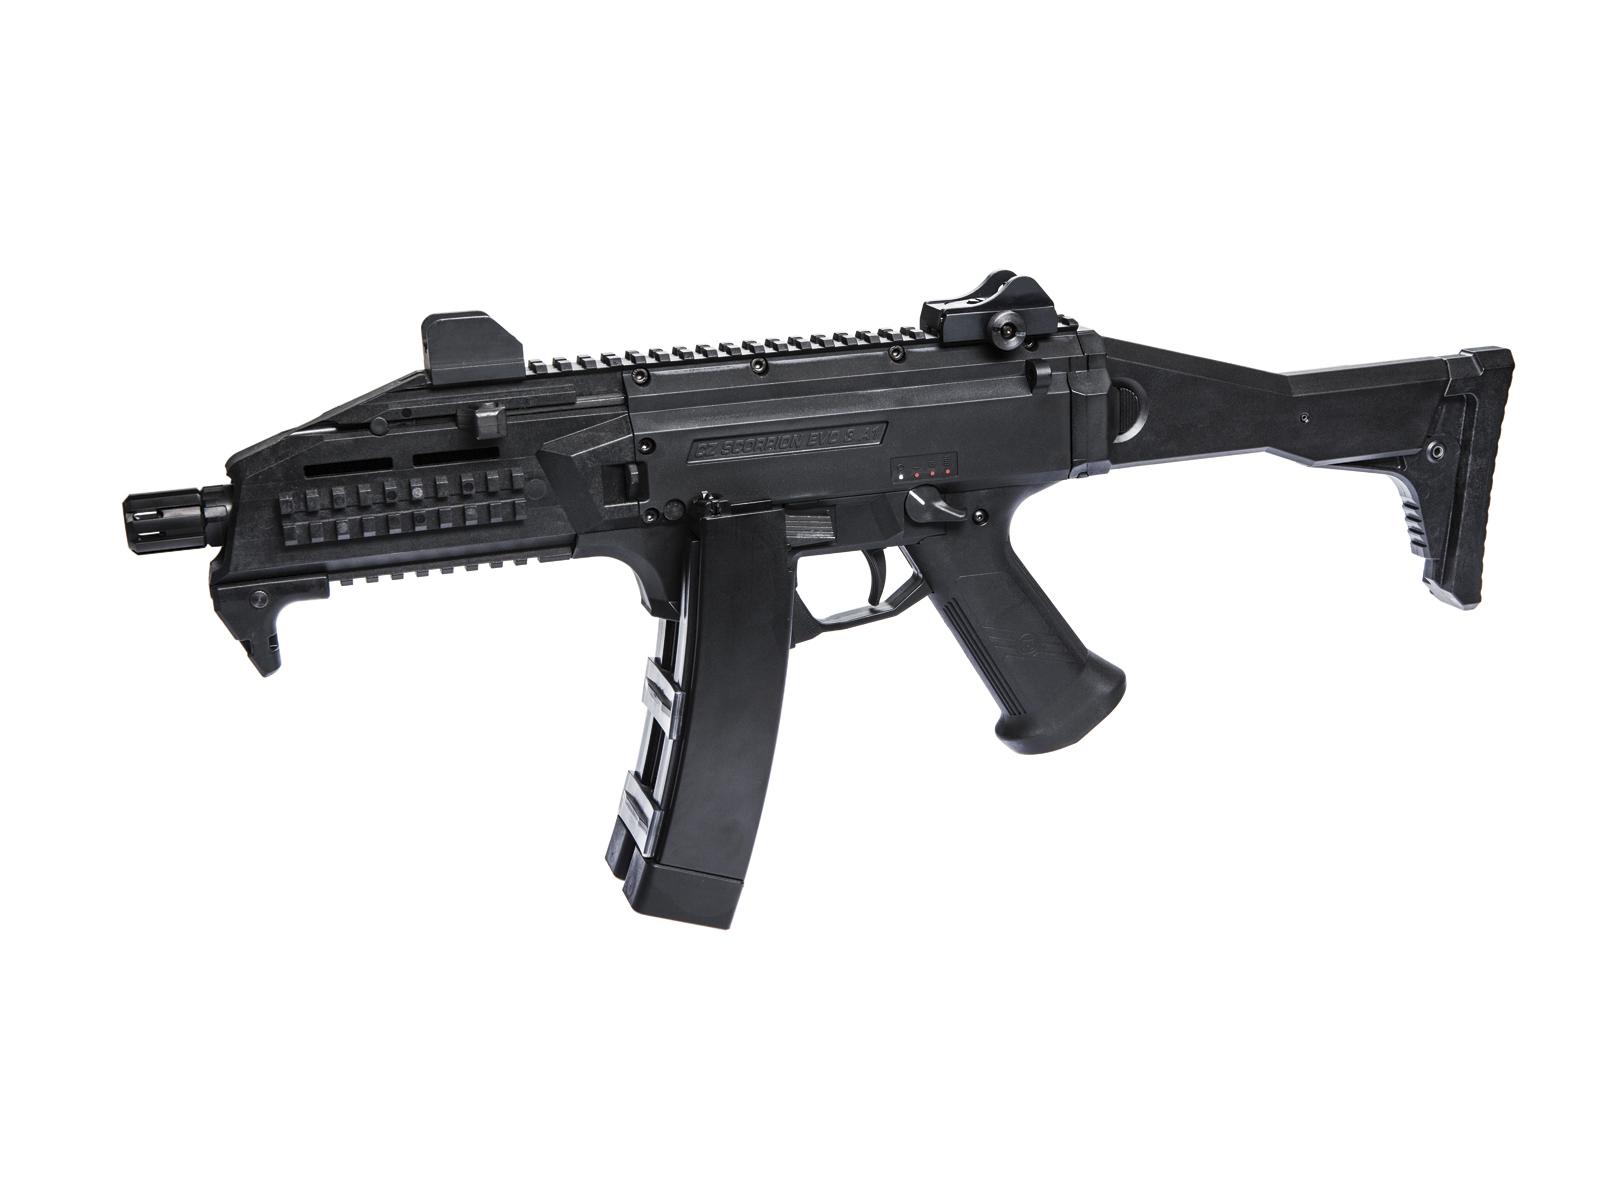 ASG CZ Scorpion EVO 3 product image